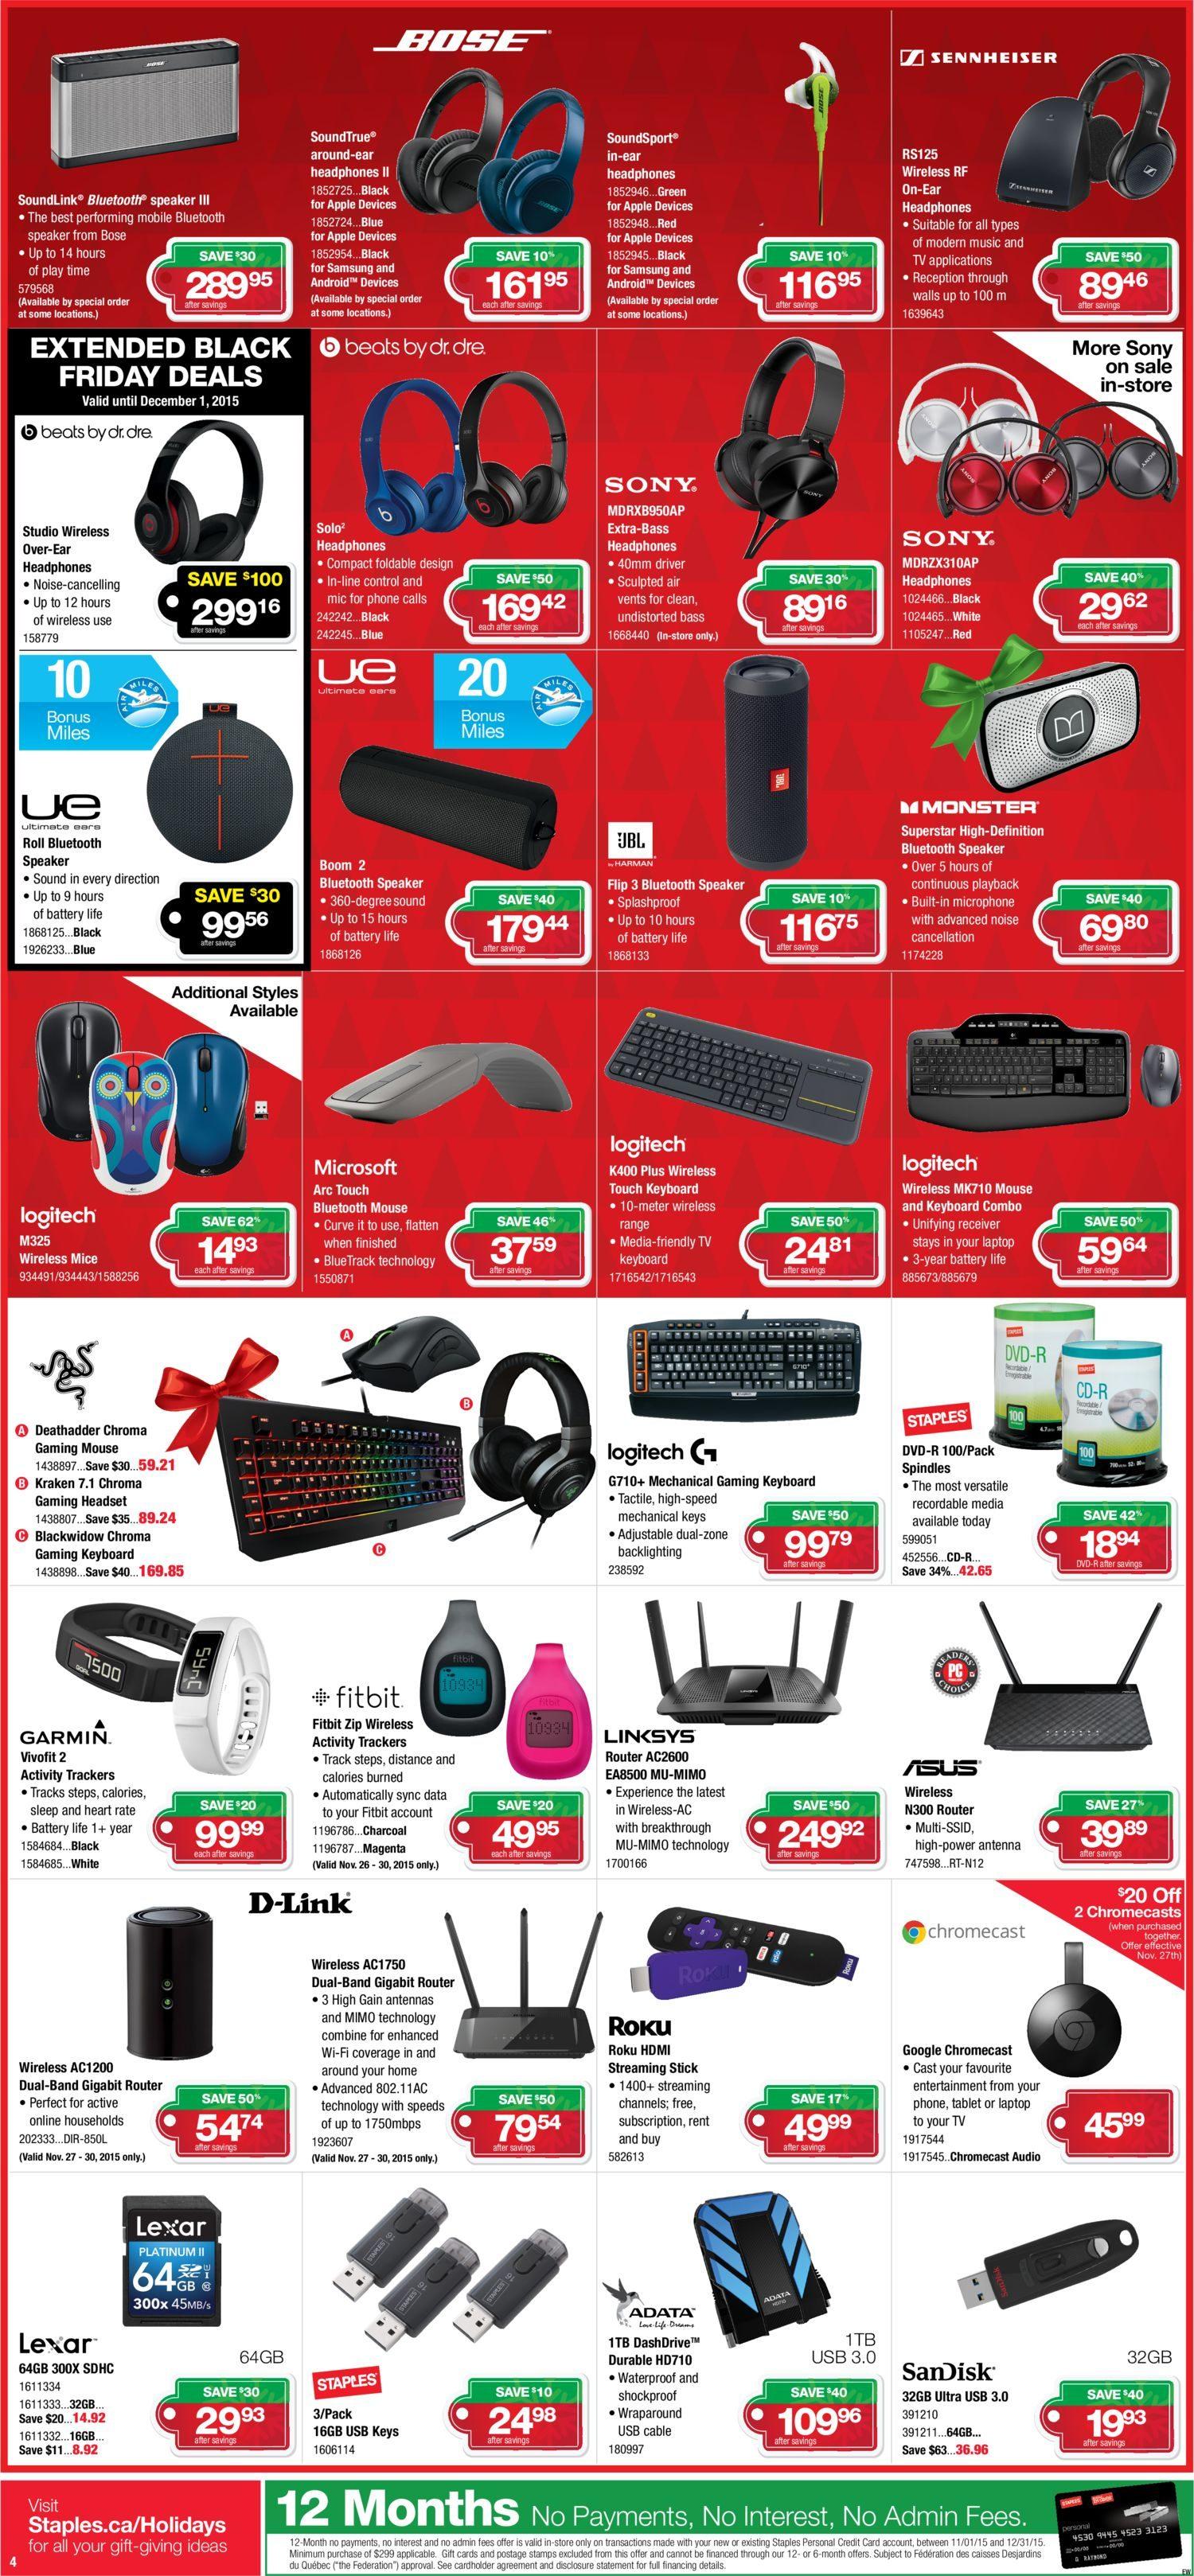 Staples Weekly Flyer Surprise Its Nov 25 Logitech Wireless Mouse M325 Circuit Board 910 002416 Dec 1